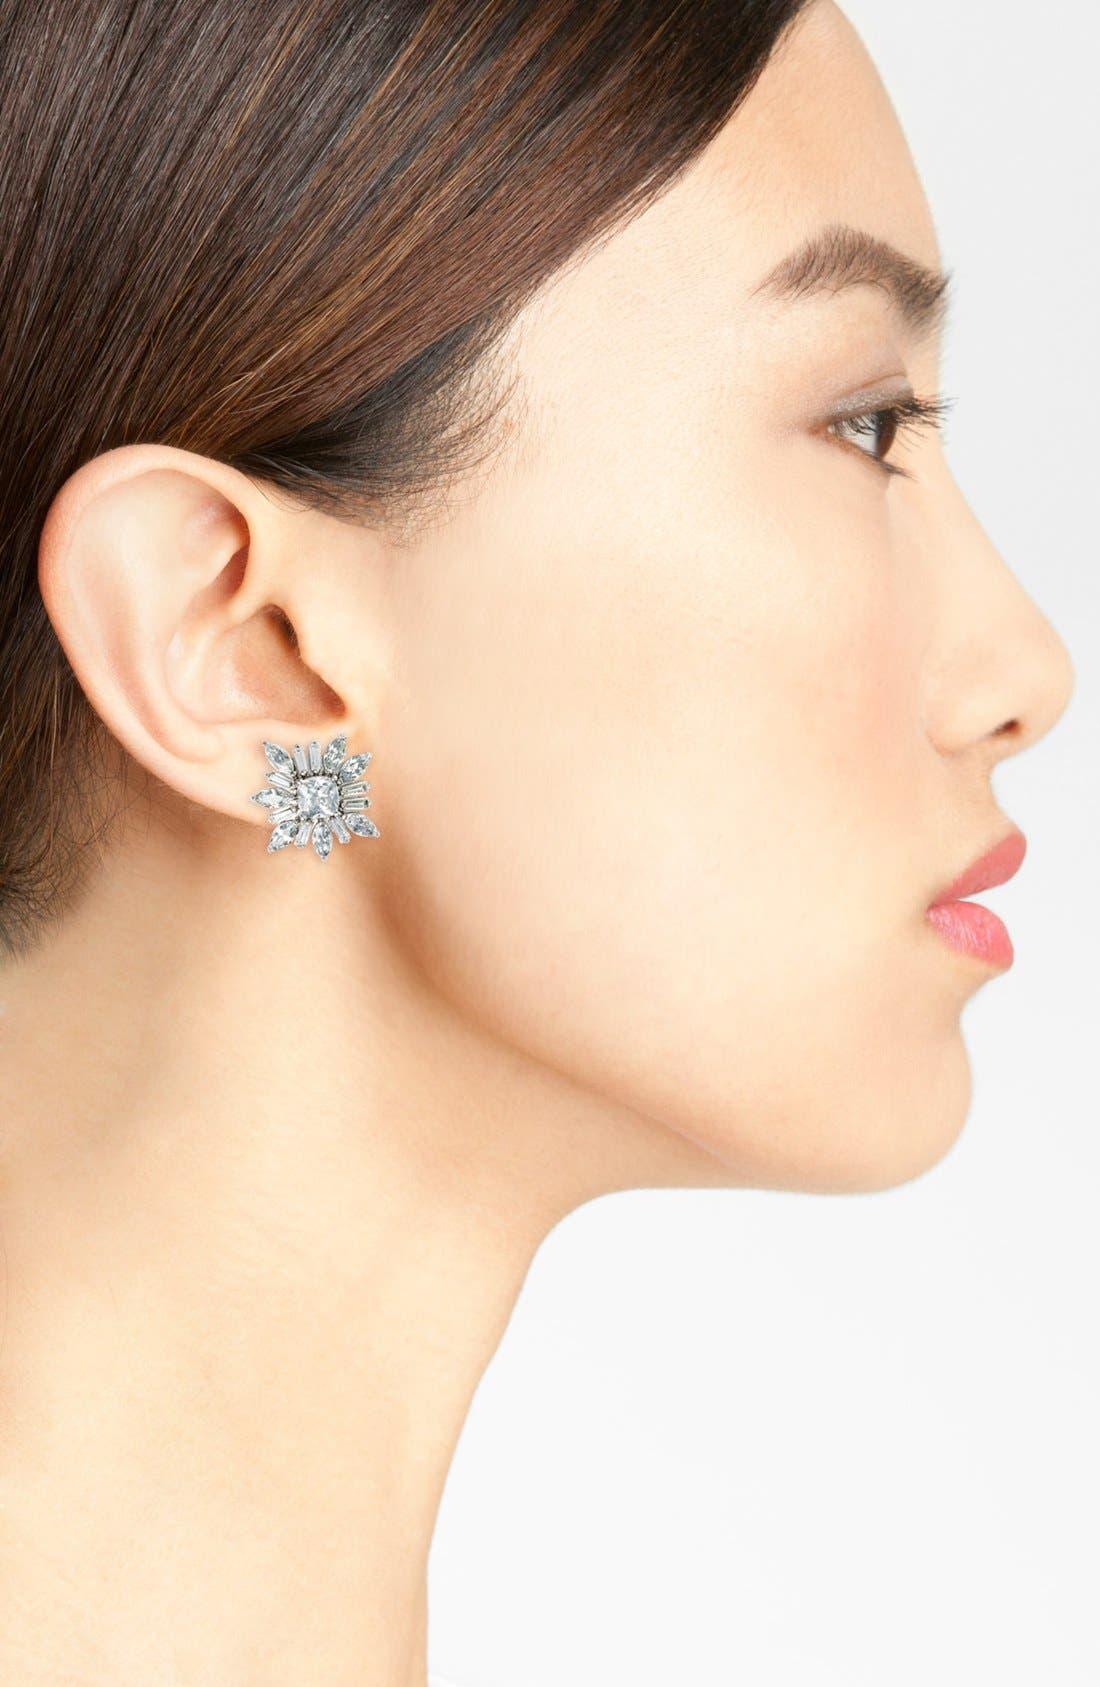 'Starburst' Cubic Zirconia Stud Earrings,                             Alternate thumbnail 2, color,                             040